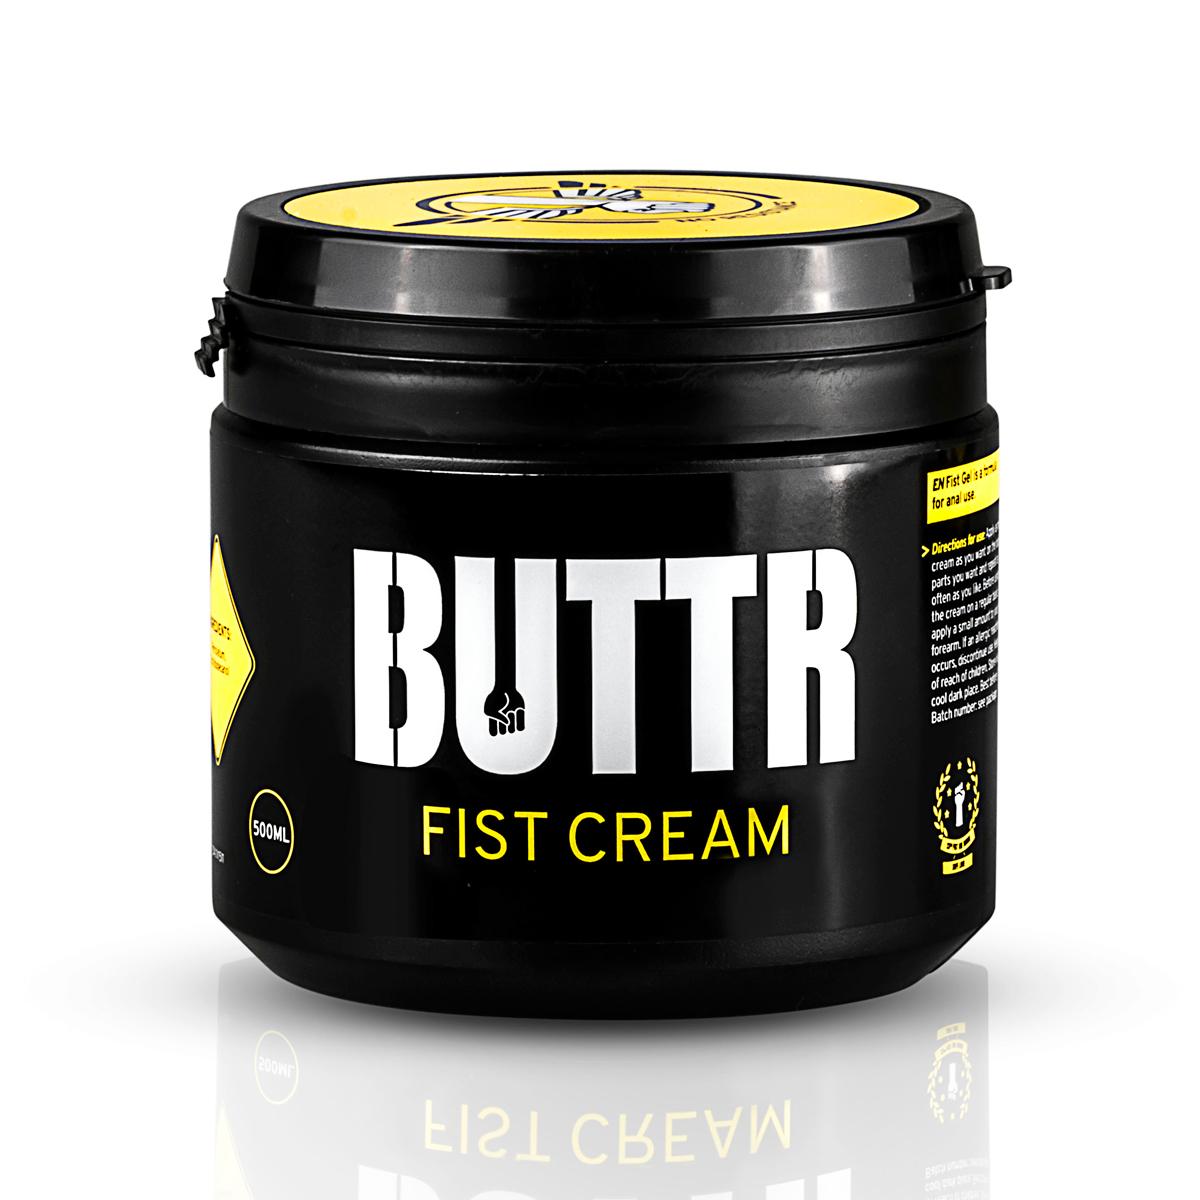 Fisting Cream   Brands, BUTTR, GLIDMEDEL ETC., GLIDMEDEL, Fisting, Anala glidmedel, Silikonbaserade glidmedel   Intimast.se - Sexleksaker